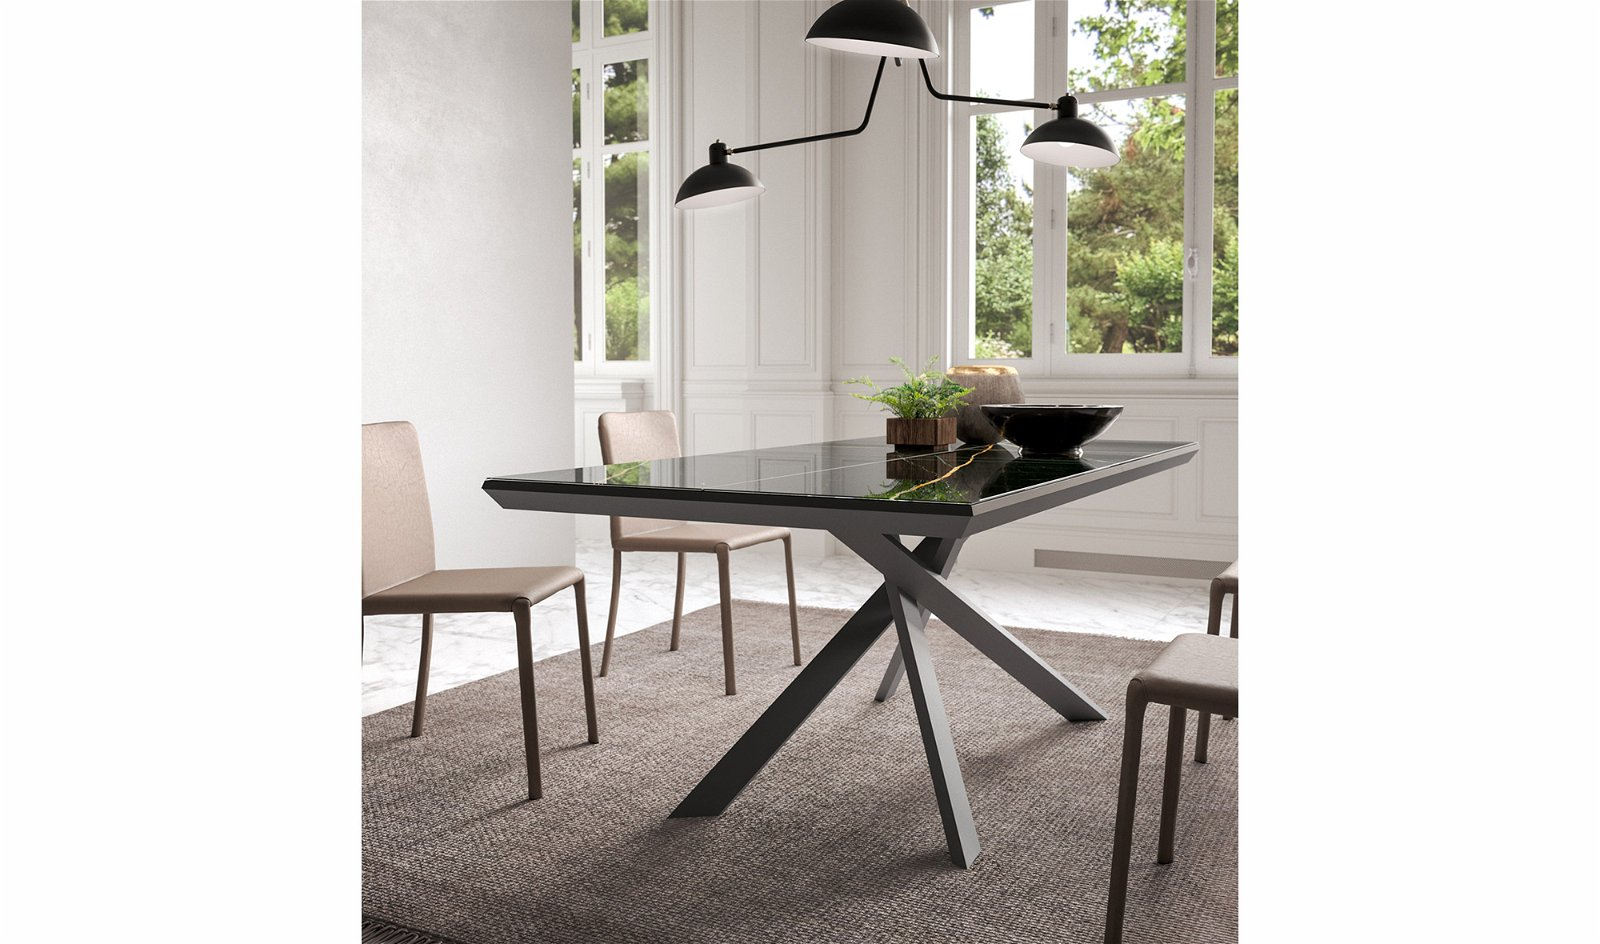 Mesa de comedor extensible cristal efecto marmol 4x4 Ozzio